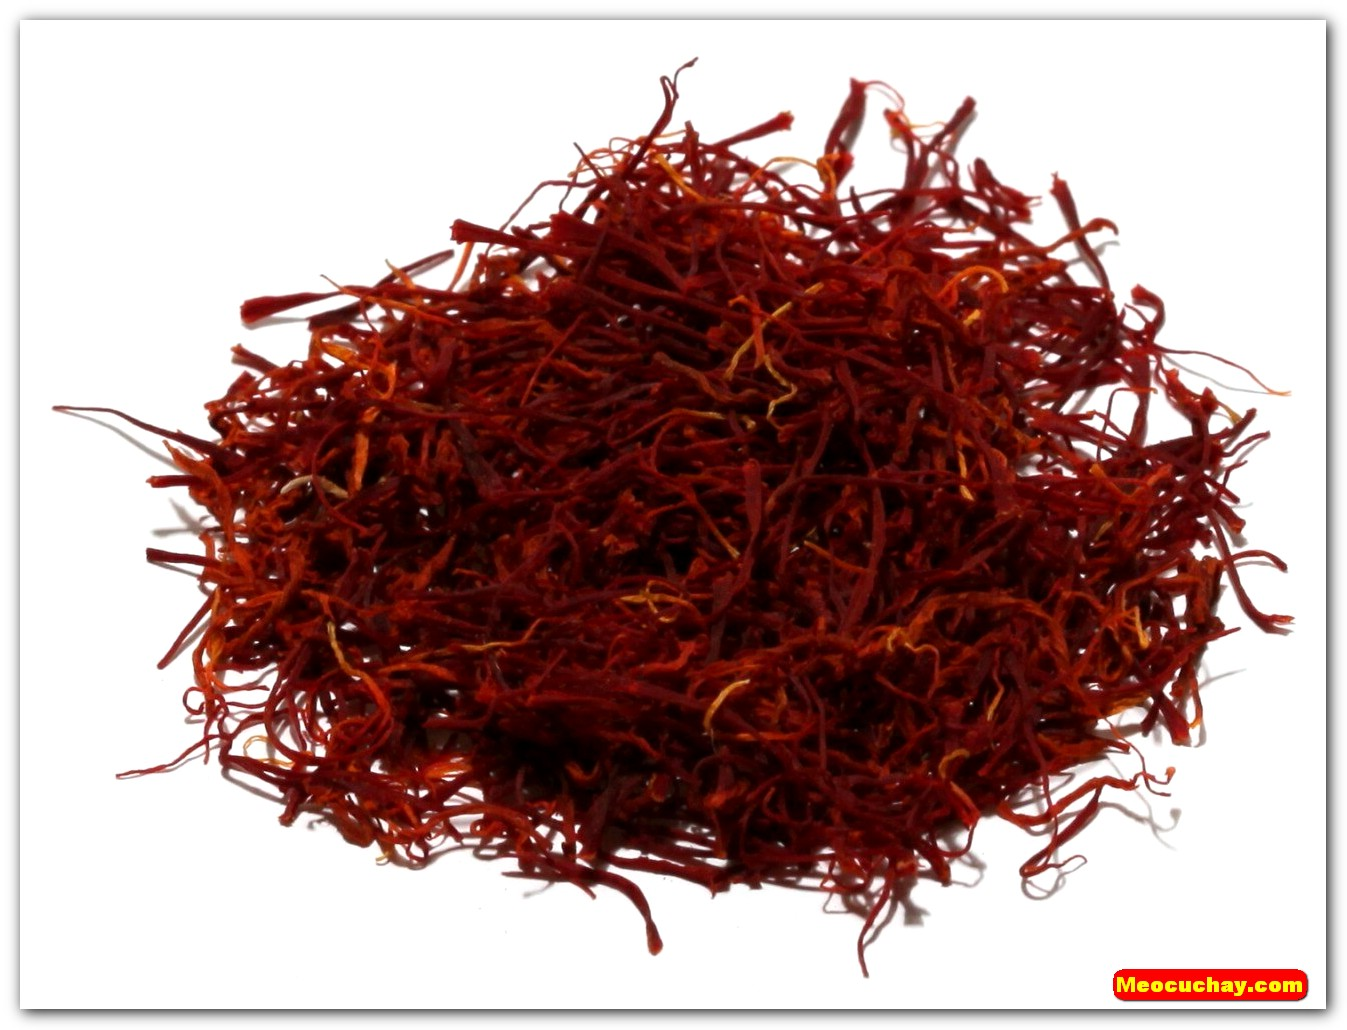 Nhuy-hoa-nghe-tay-saffron-iran (34)